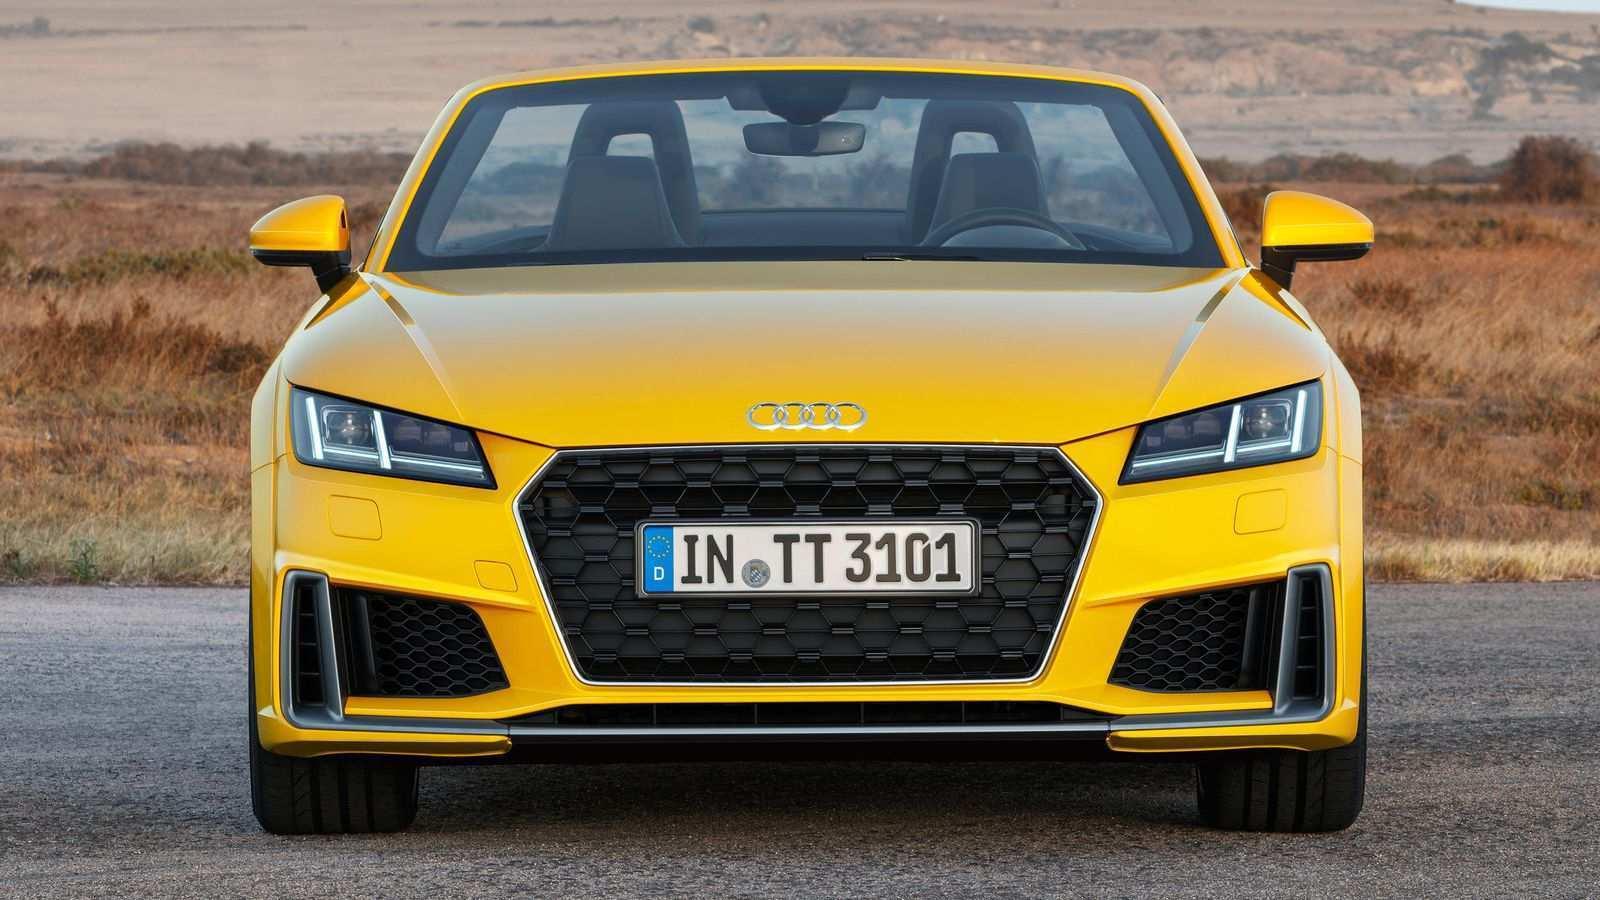 98 Great 2019 Audi Tt Release Date Redesign with 2019 Audi Tt Release Date